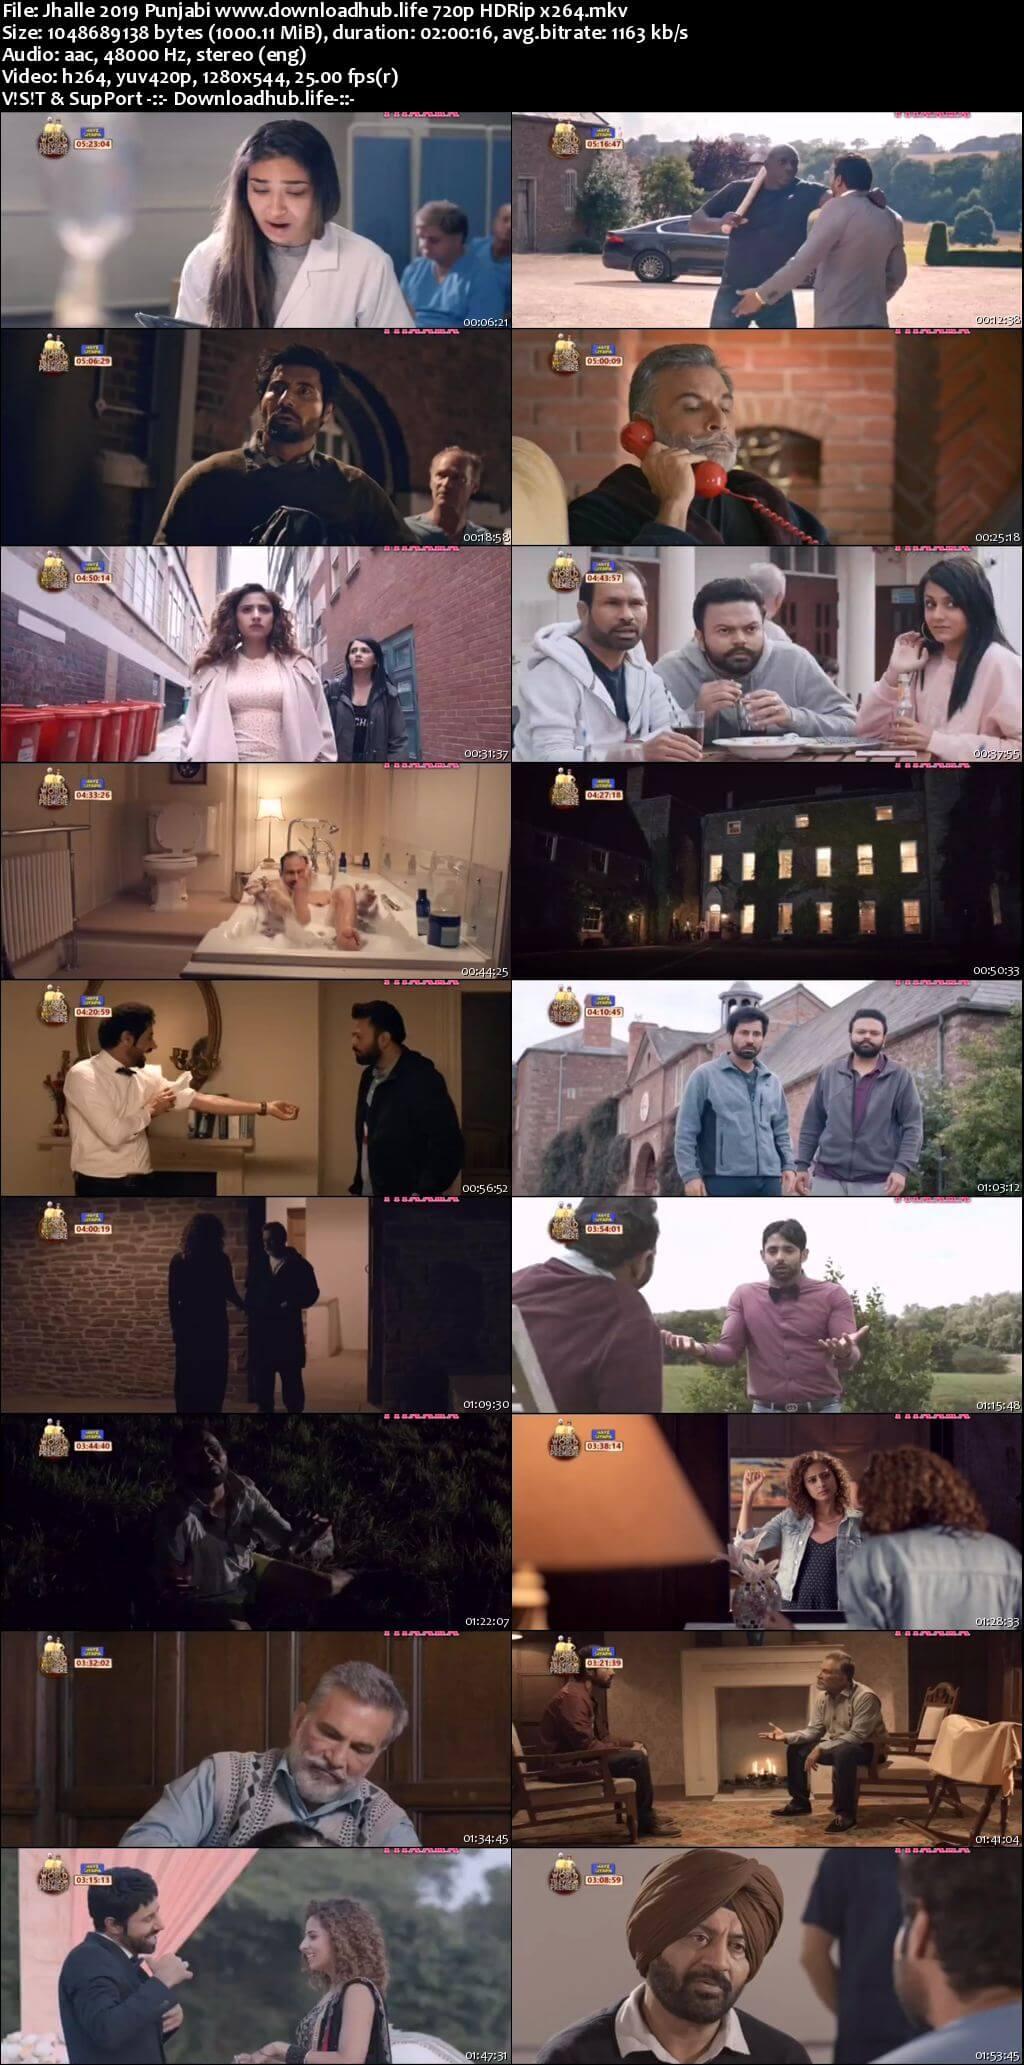 Jhalle 2019 Punjabi 720p HDTV x264